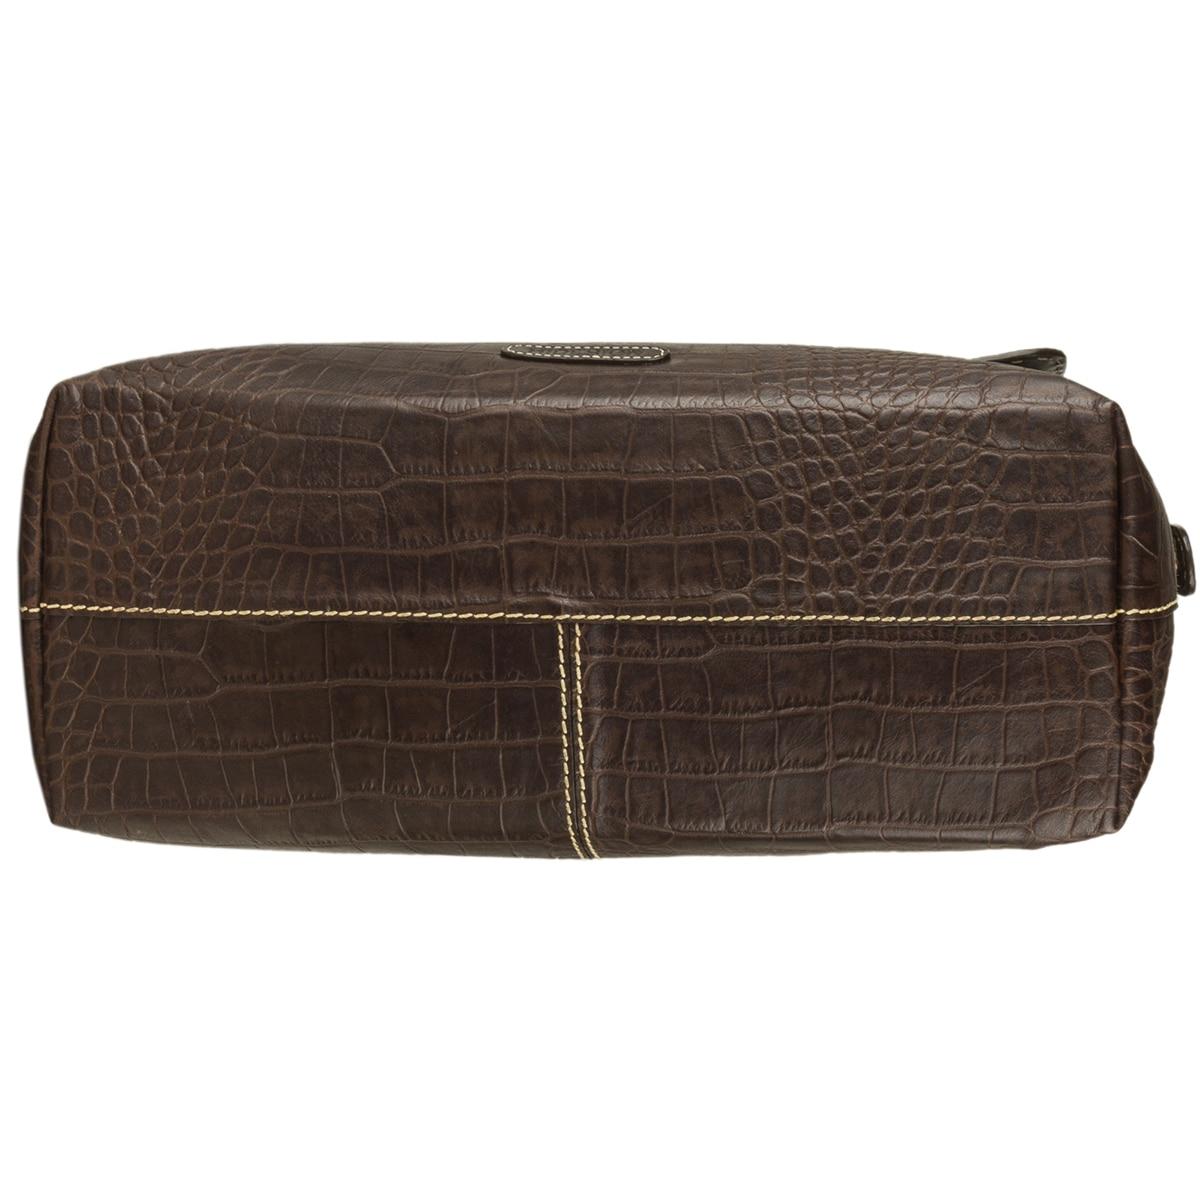 47dbd5c21306 Hidesign Women's Leather 14-inch Laptop Work Bag